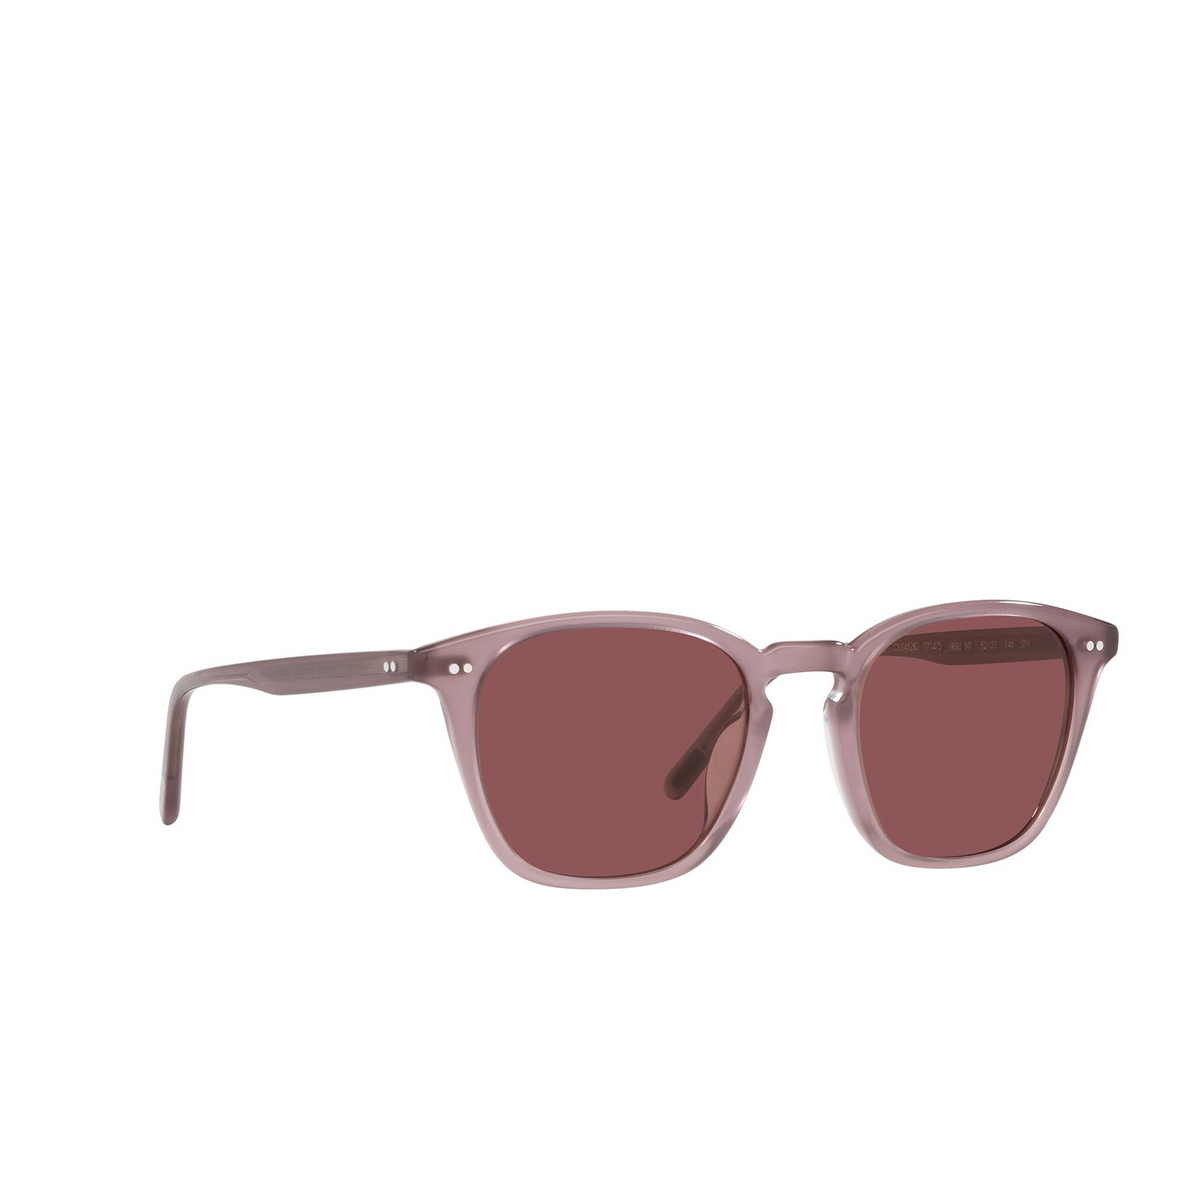 Oliver Peoples® Square Sunglasses: Frère Ny OV5462SU color Mauve 171475 - three-quarters view.